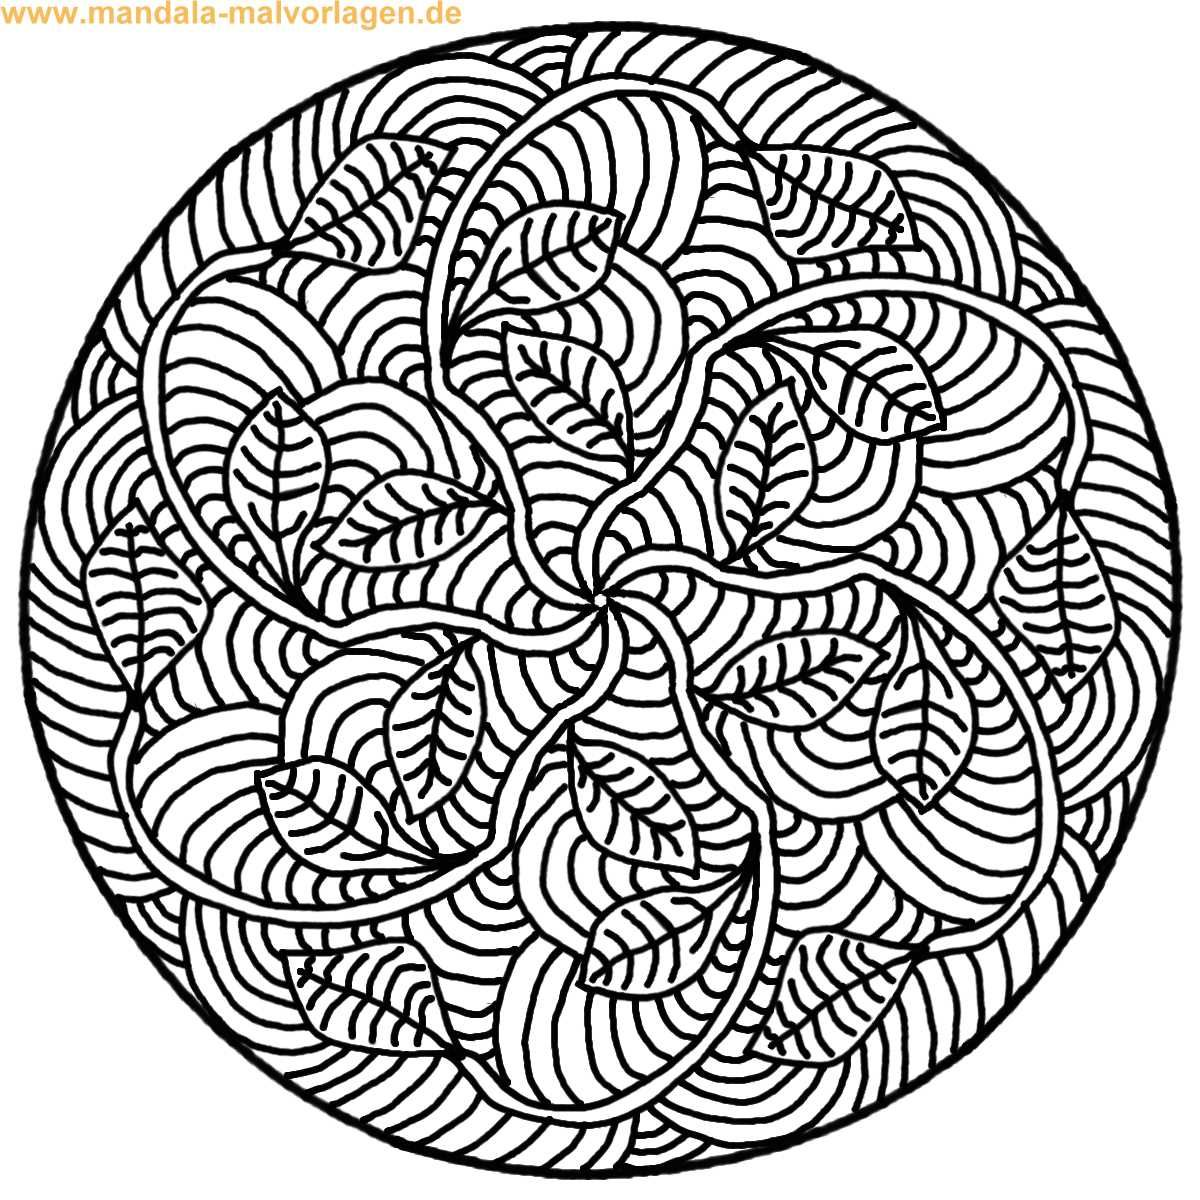 Ausmalbilder Mandala Schwer Mandalas Zum Ausmalen Ausmalen Ausmalbilder